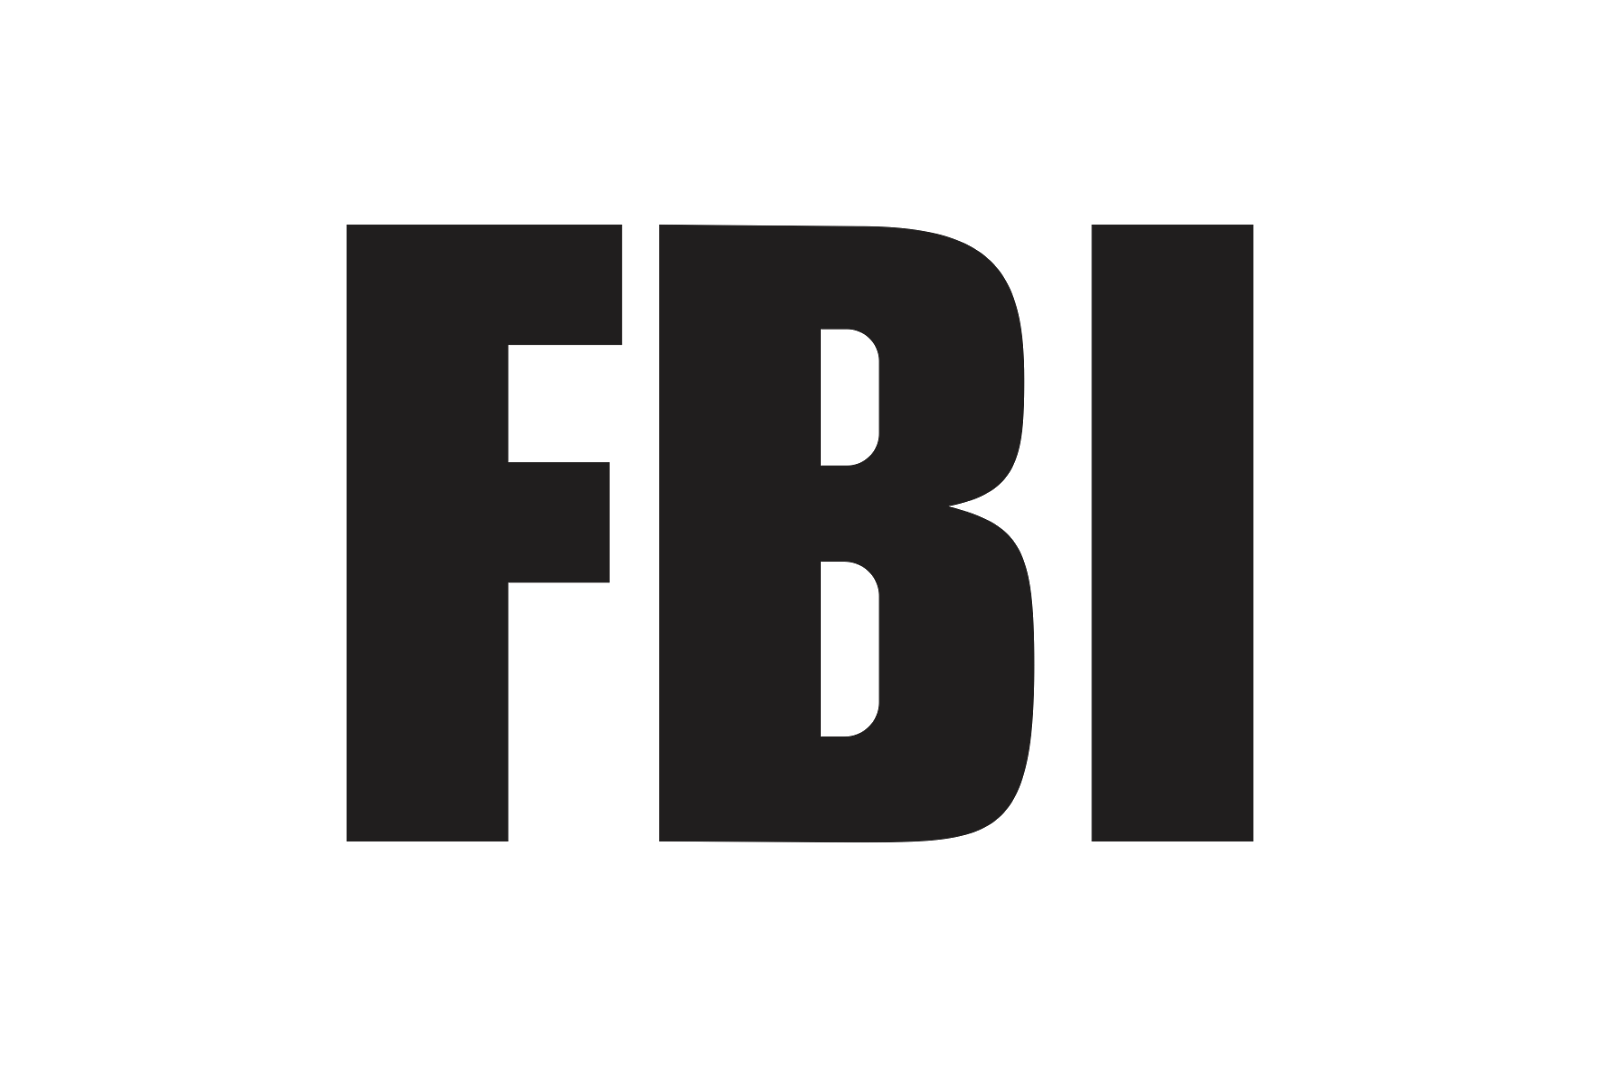 fbi logo logoshare